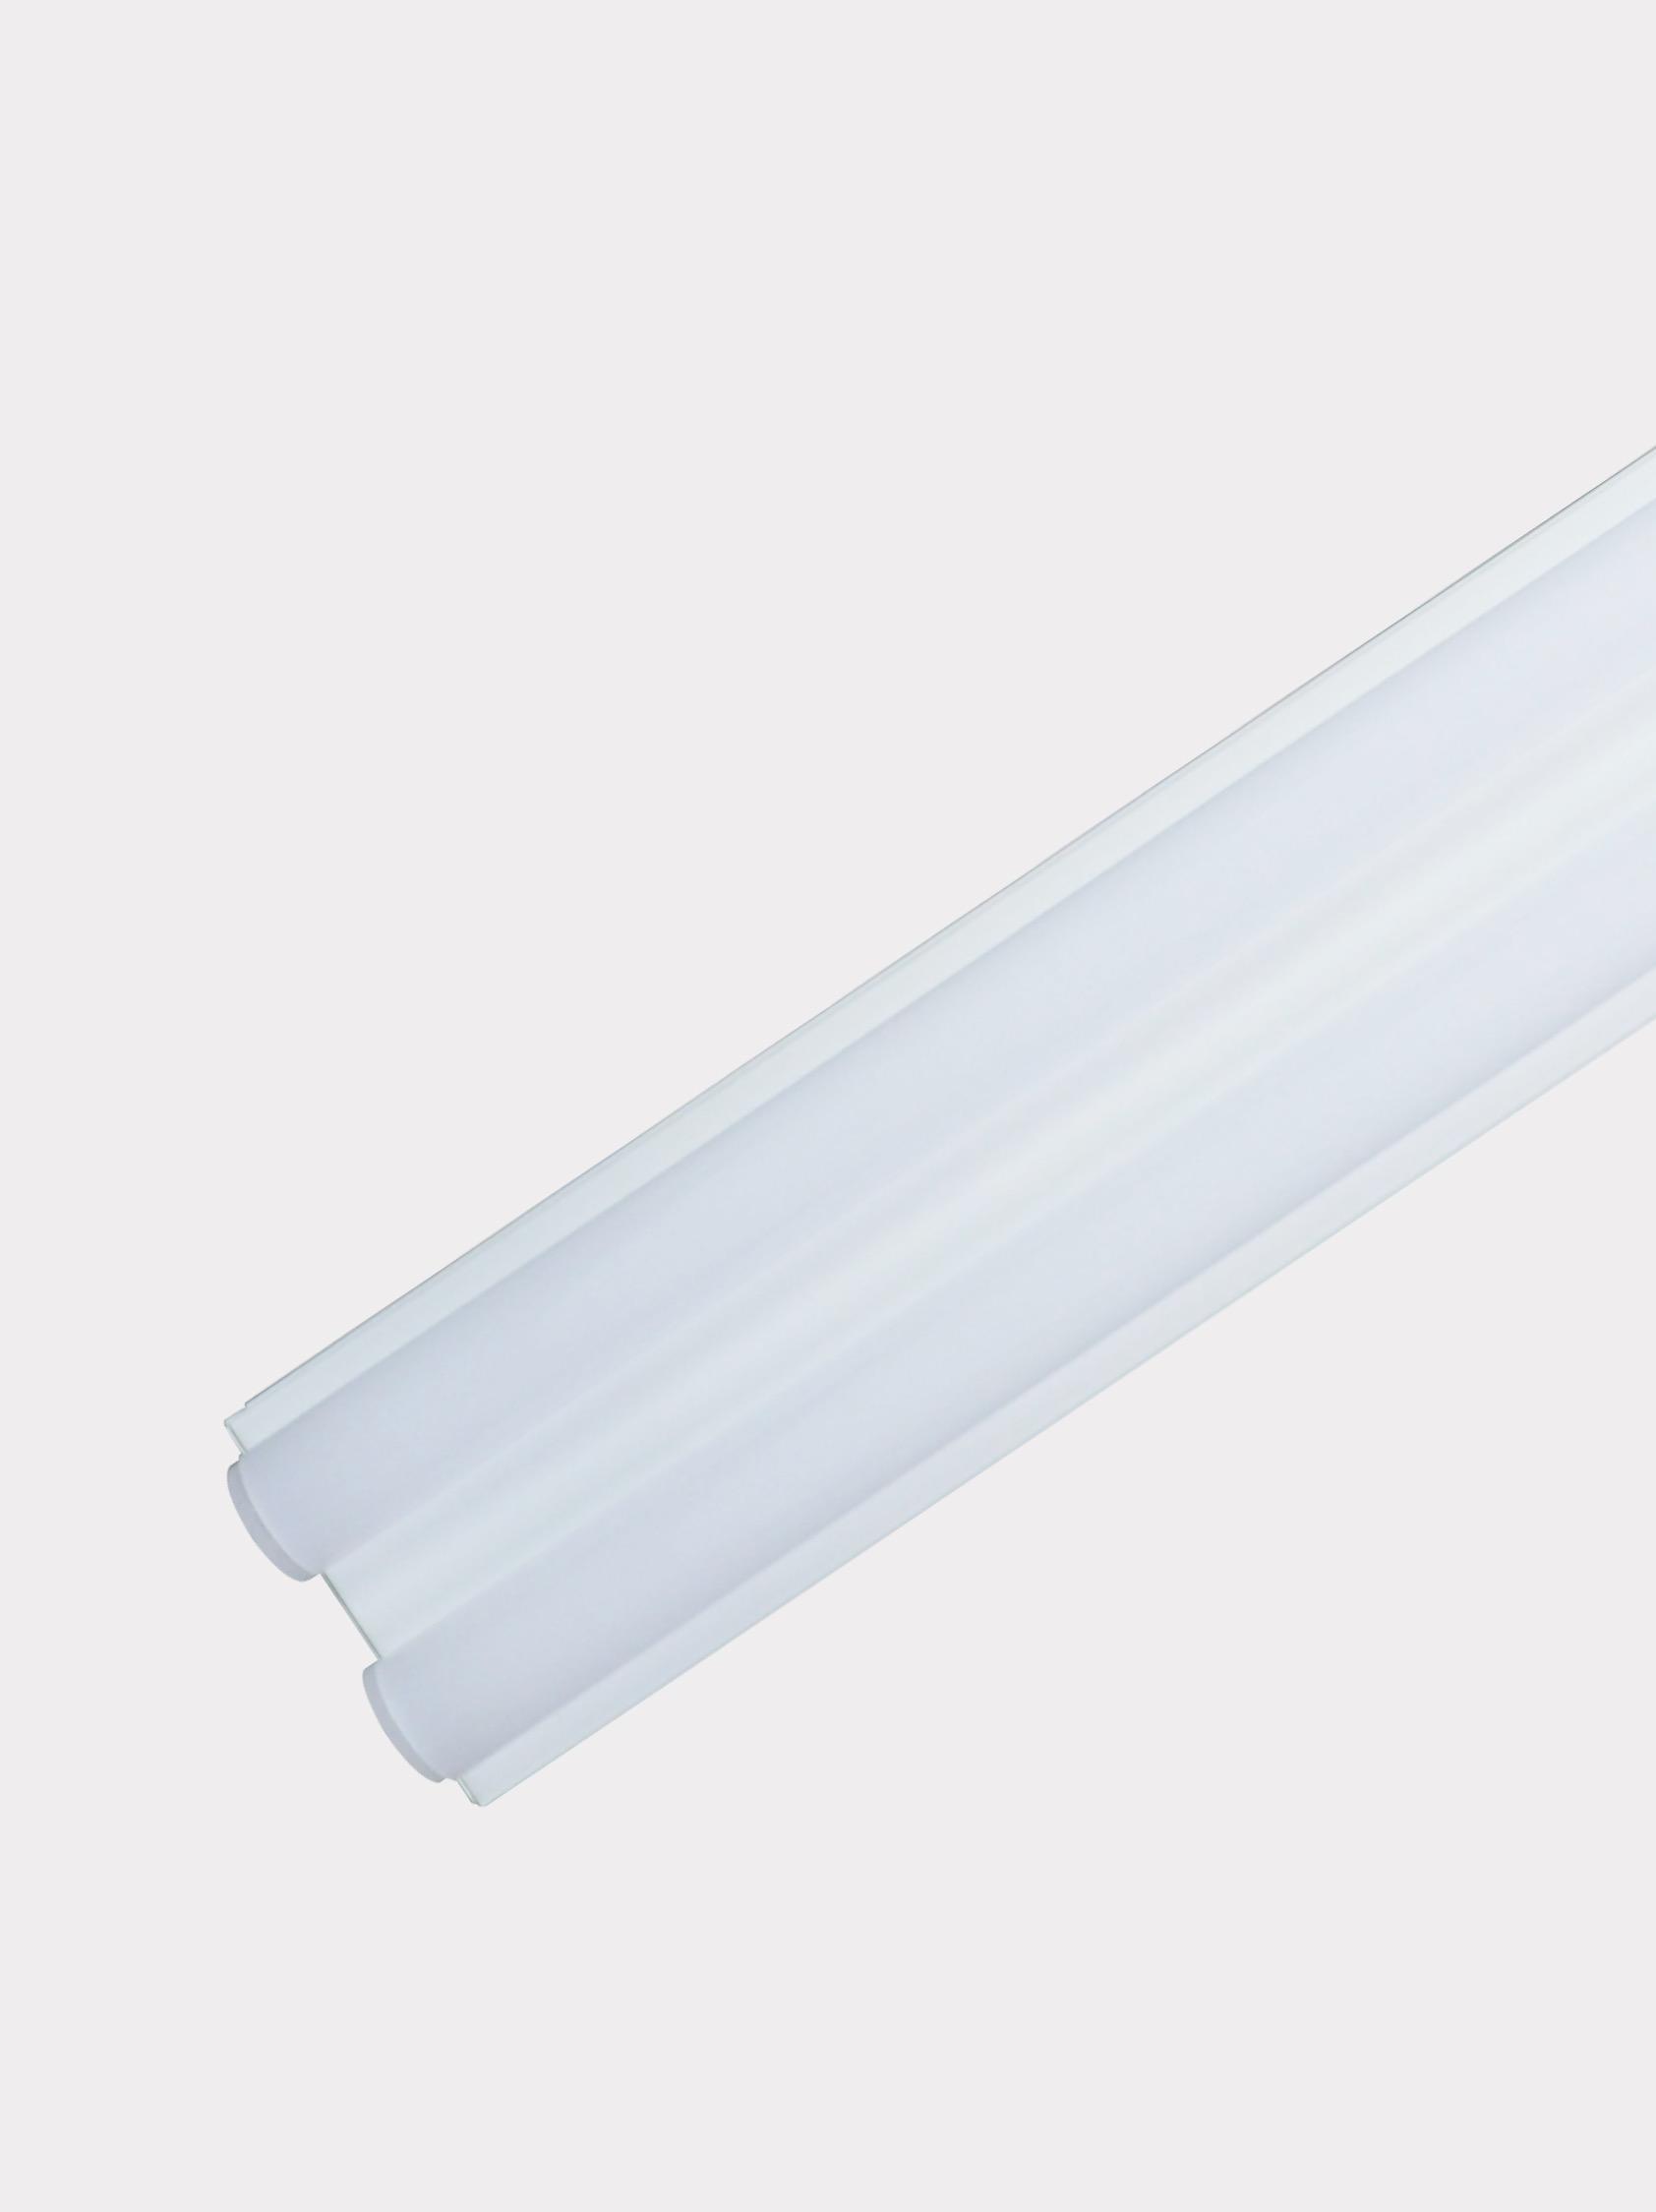 Strip_Light-2